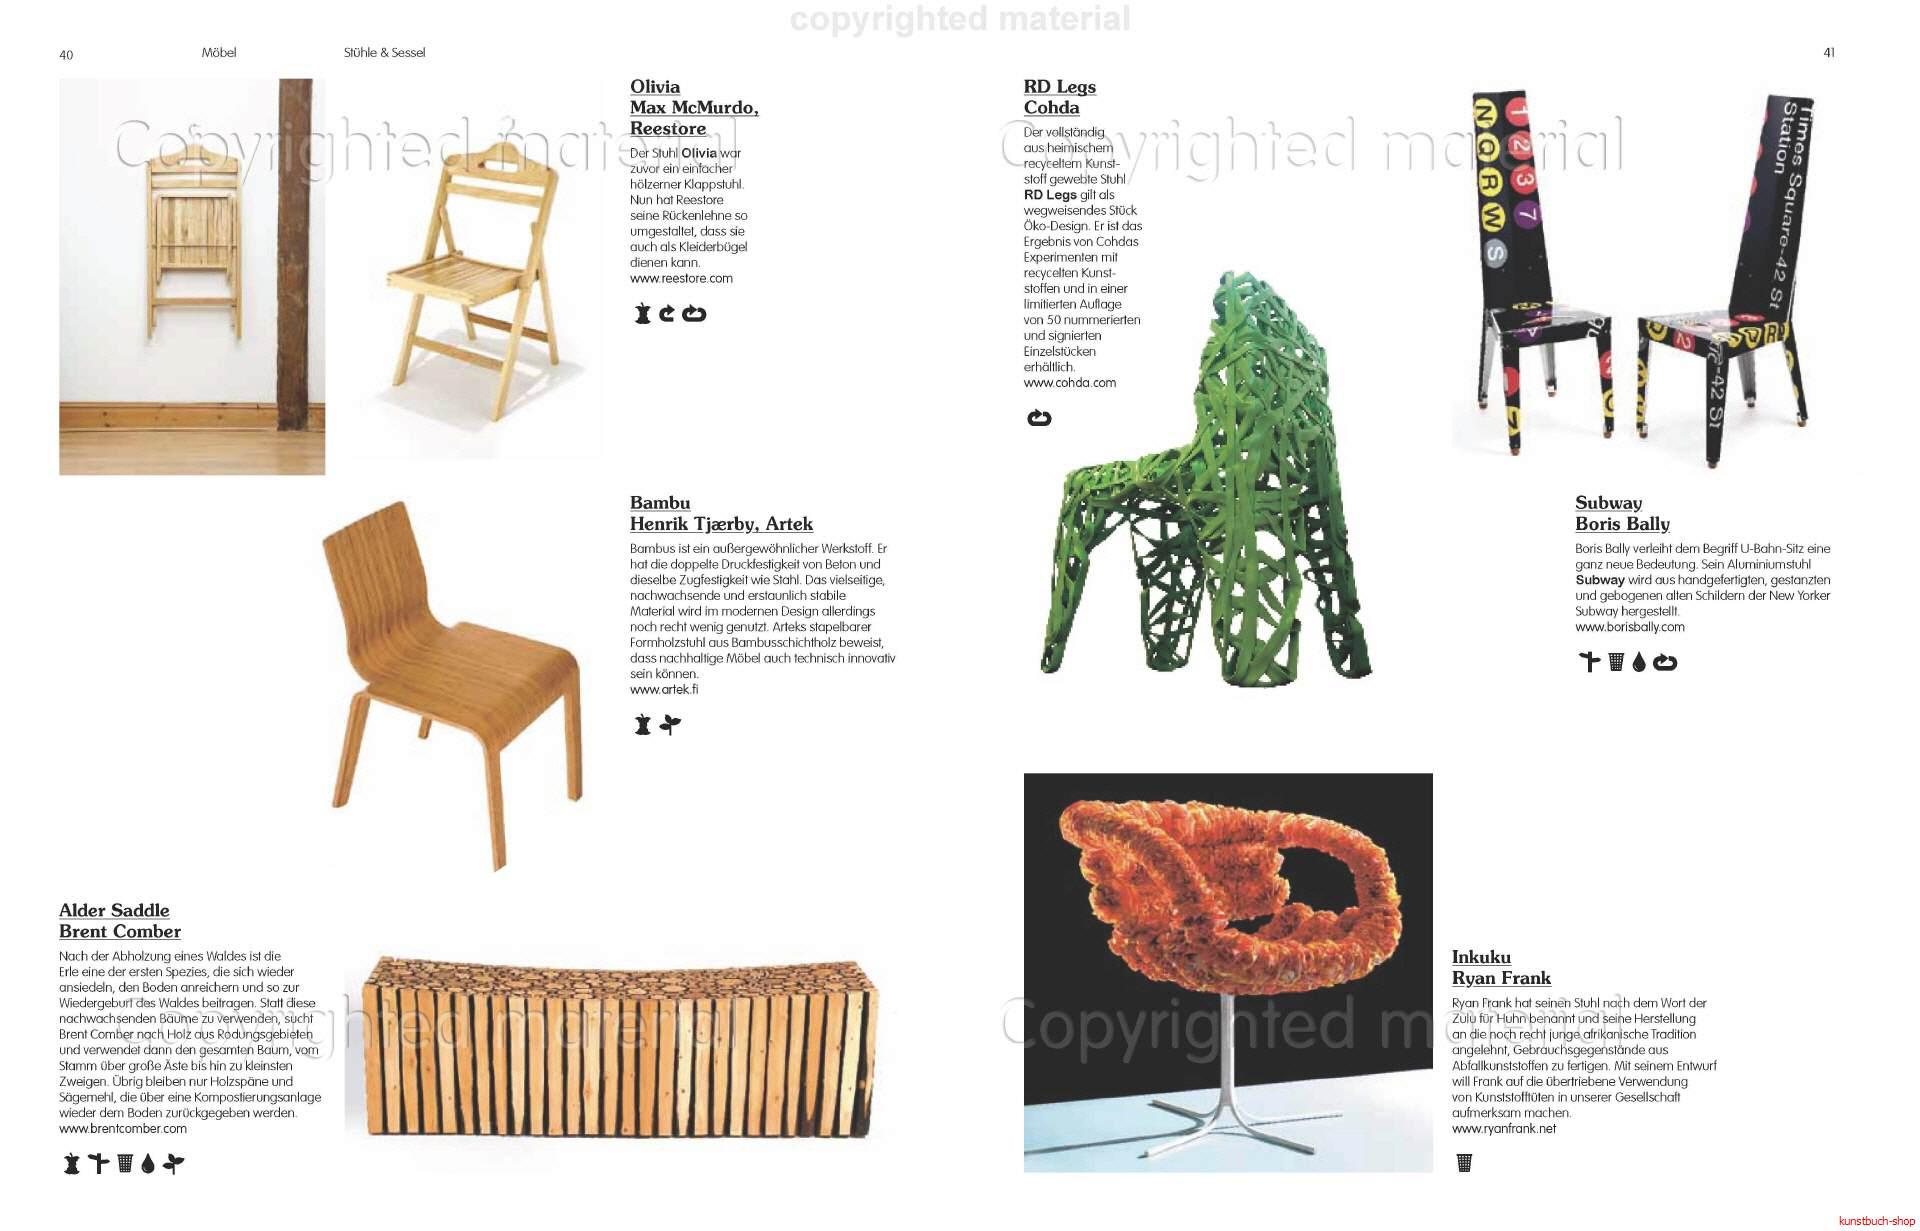 kunstbuch-shop.de   Ursula Banz